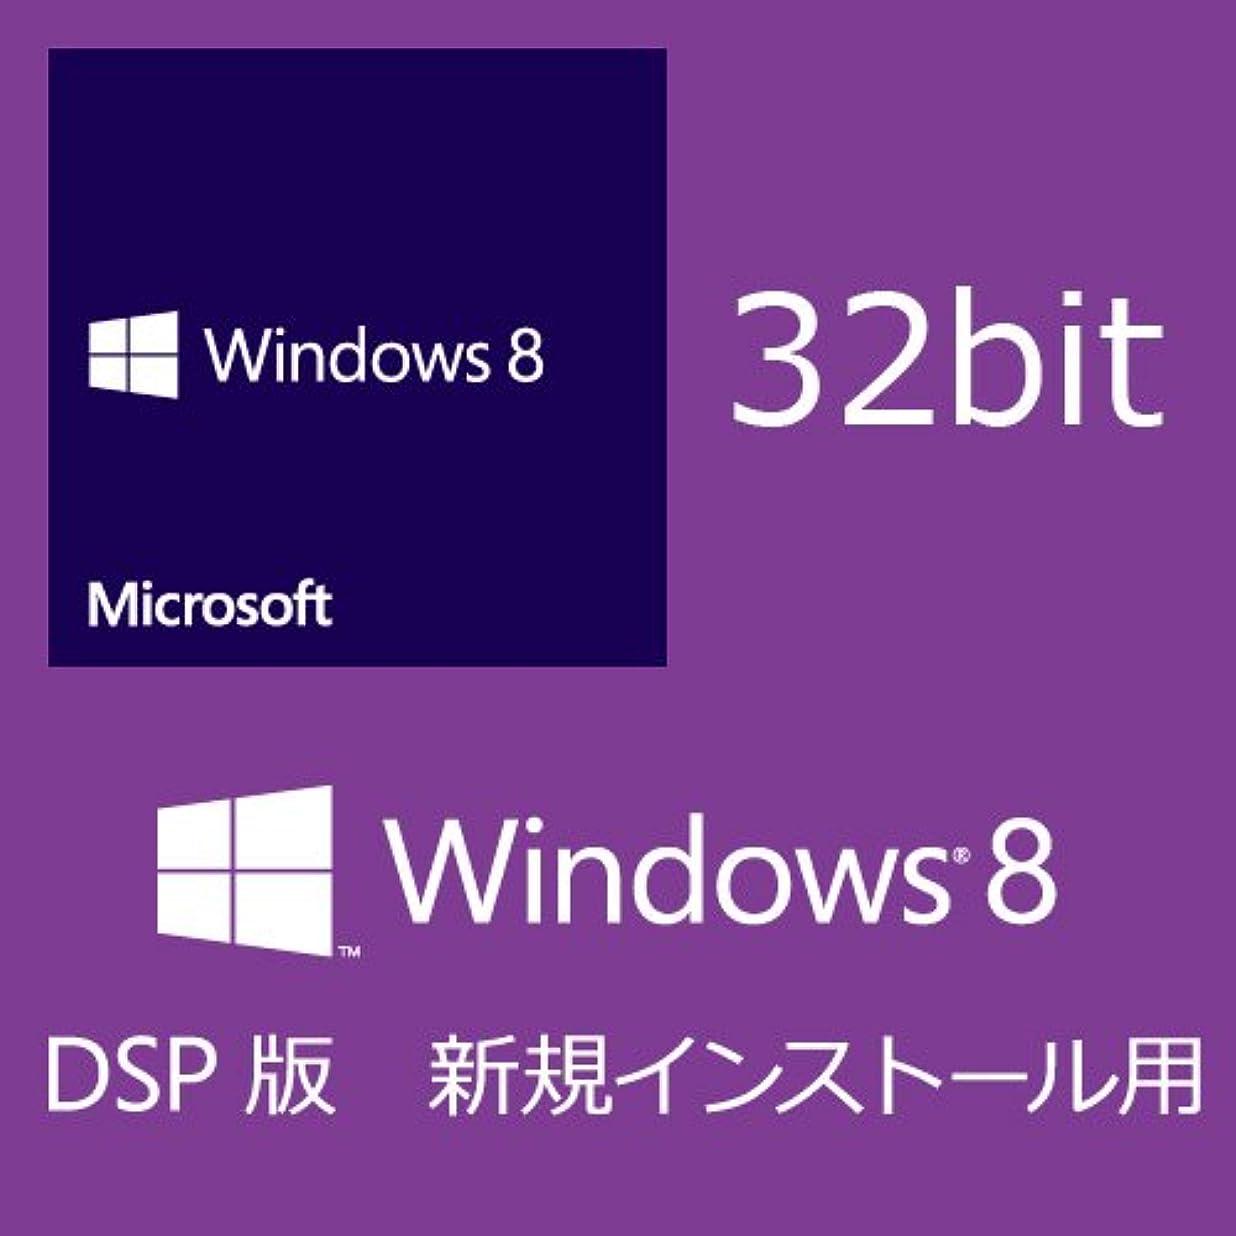 手歴史管理【旧商品】Microsoft Windows 8 (DSP版) 32bit 日本語(新規インストール用)